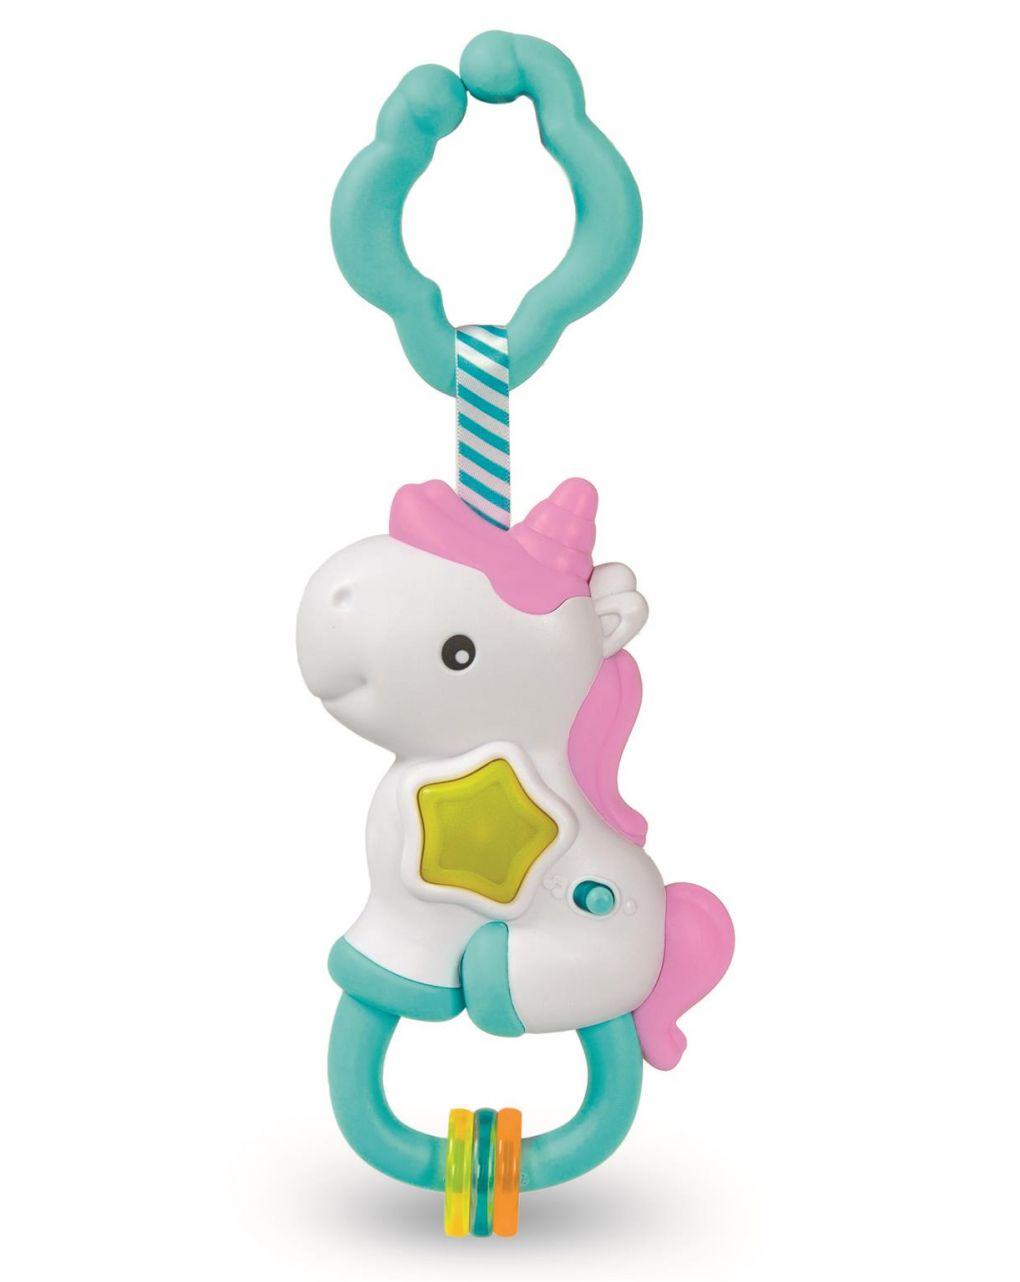 Baby clementoni - unicorno interattivo - Clementoni